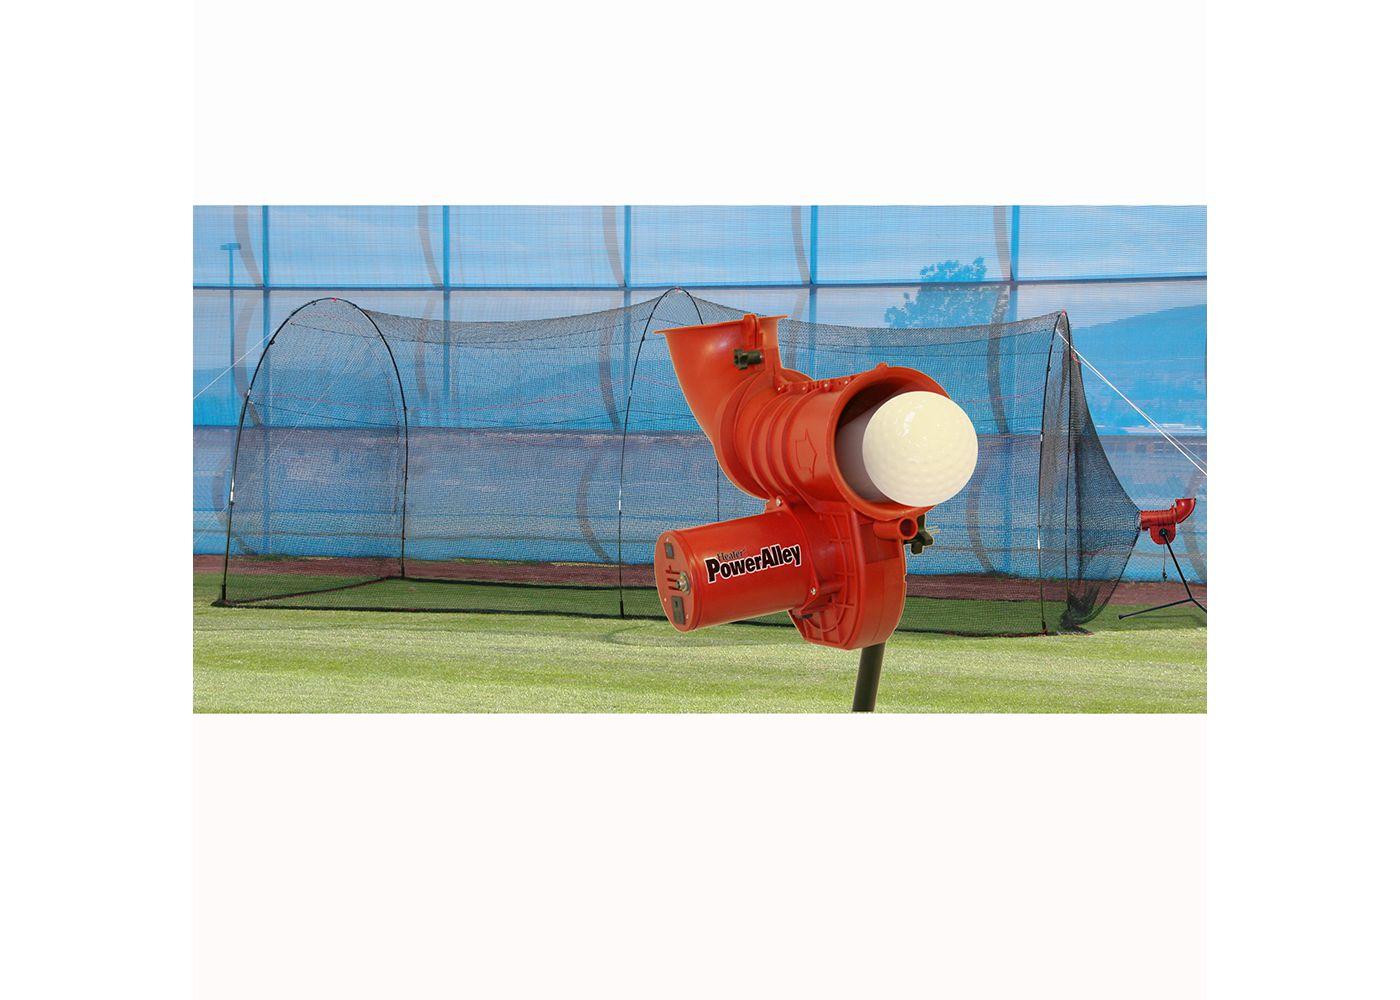 "Heater PowerAlley 11"" Softball Pitching Machine & PowerAlley 22' Batting Cage"